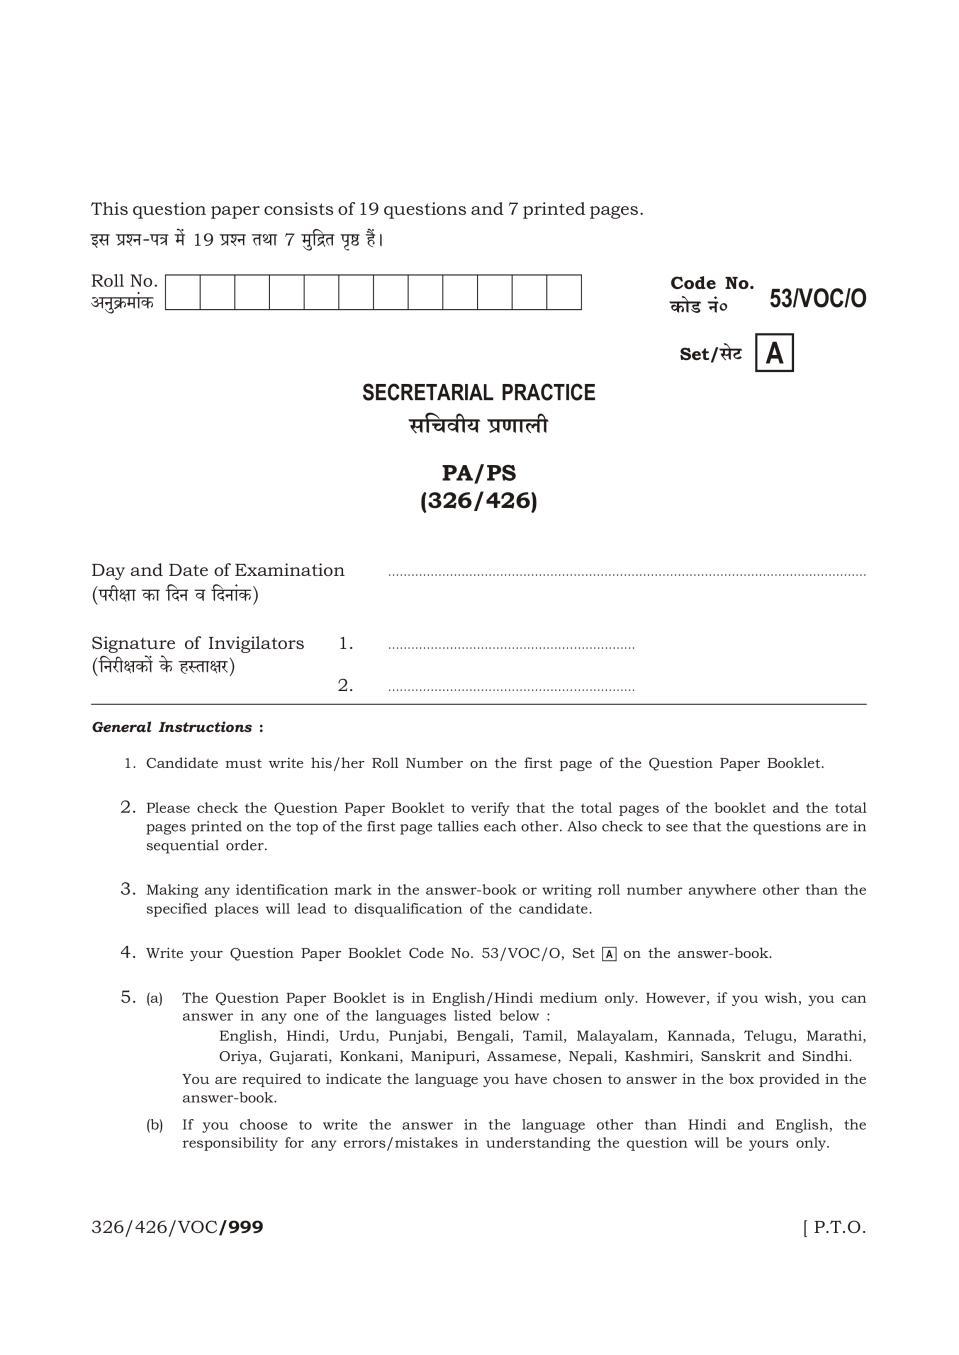 NIOS Class 12 Question Paper Oct 2016 - Secretarial Practice - Page 1